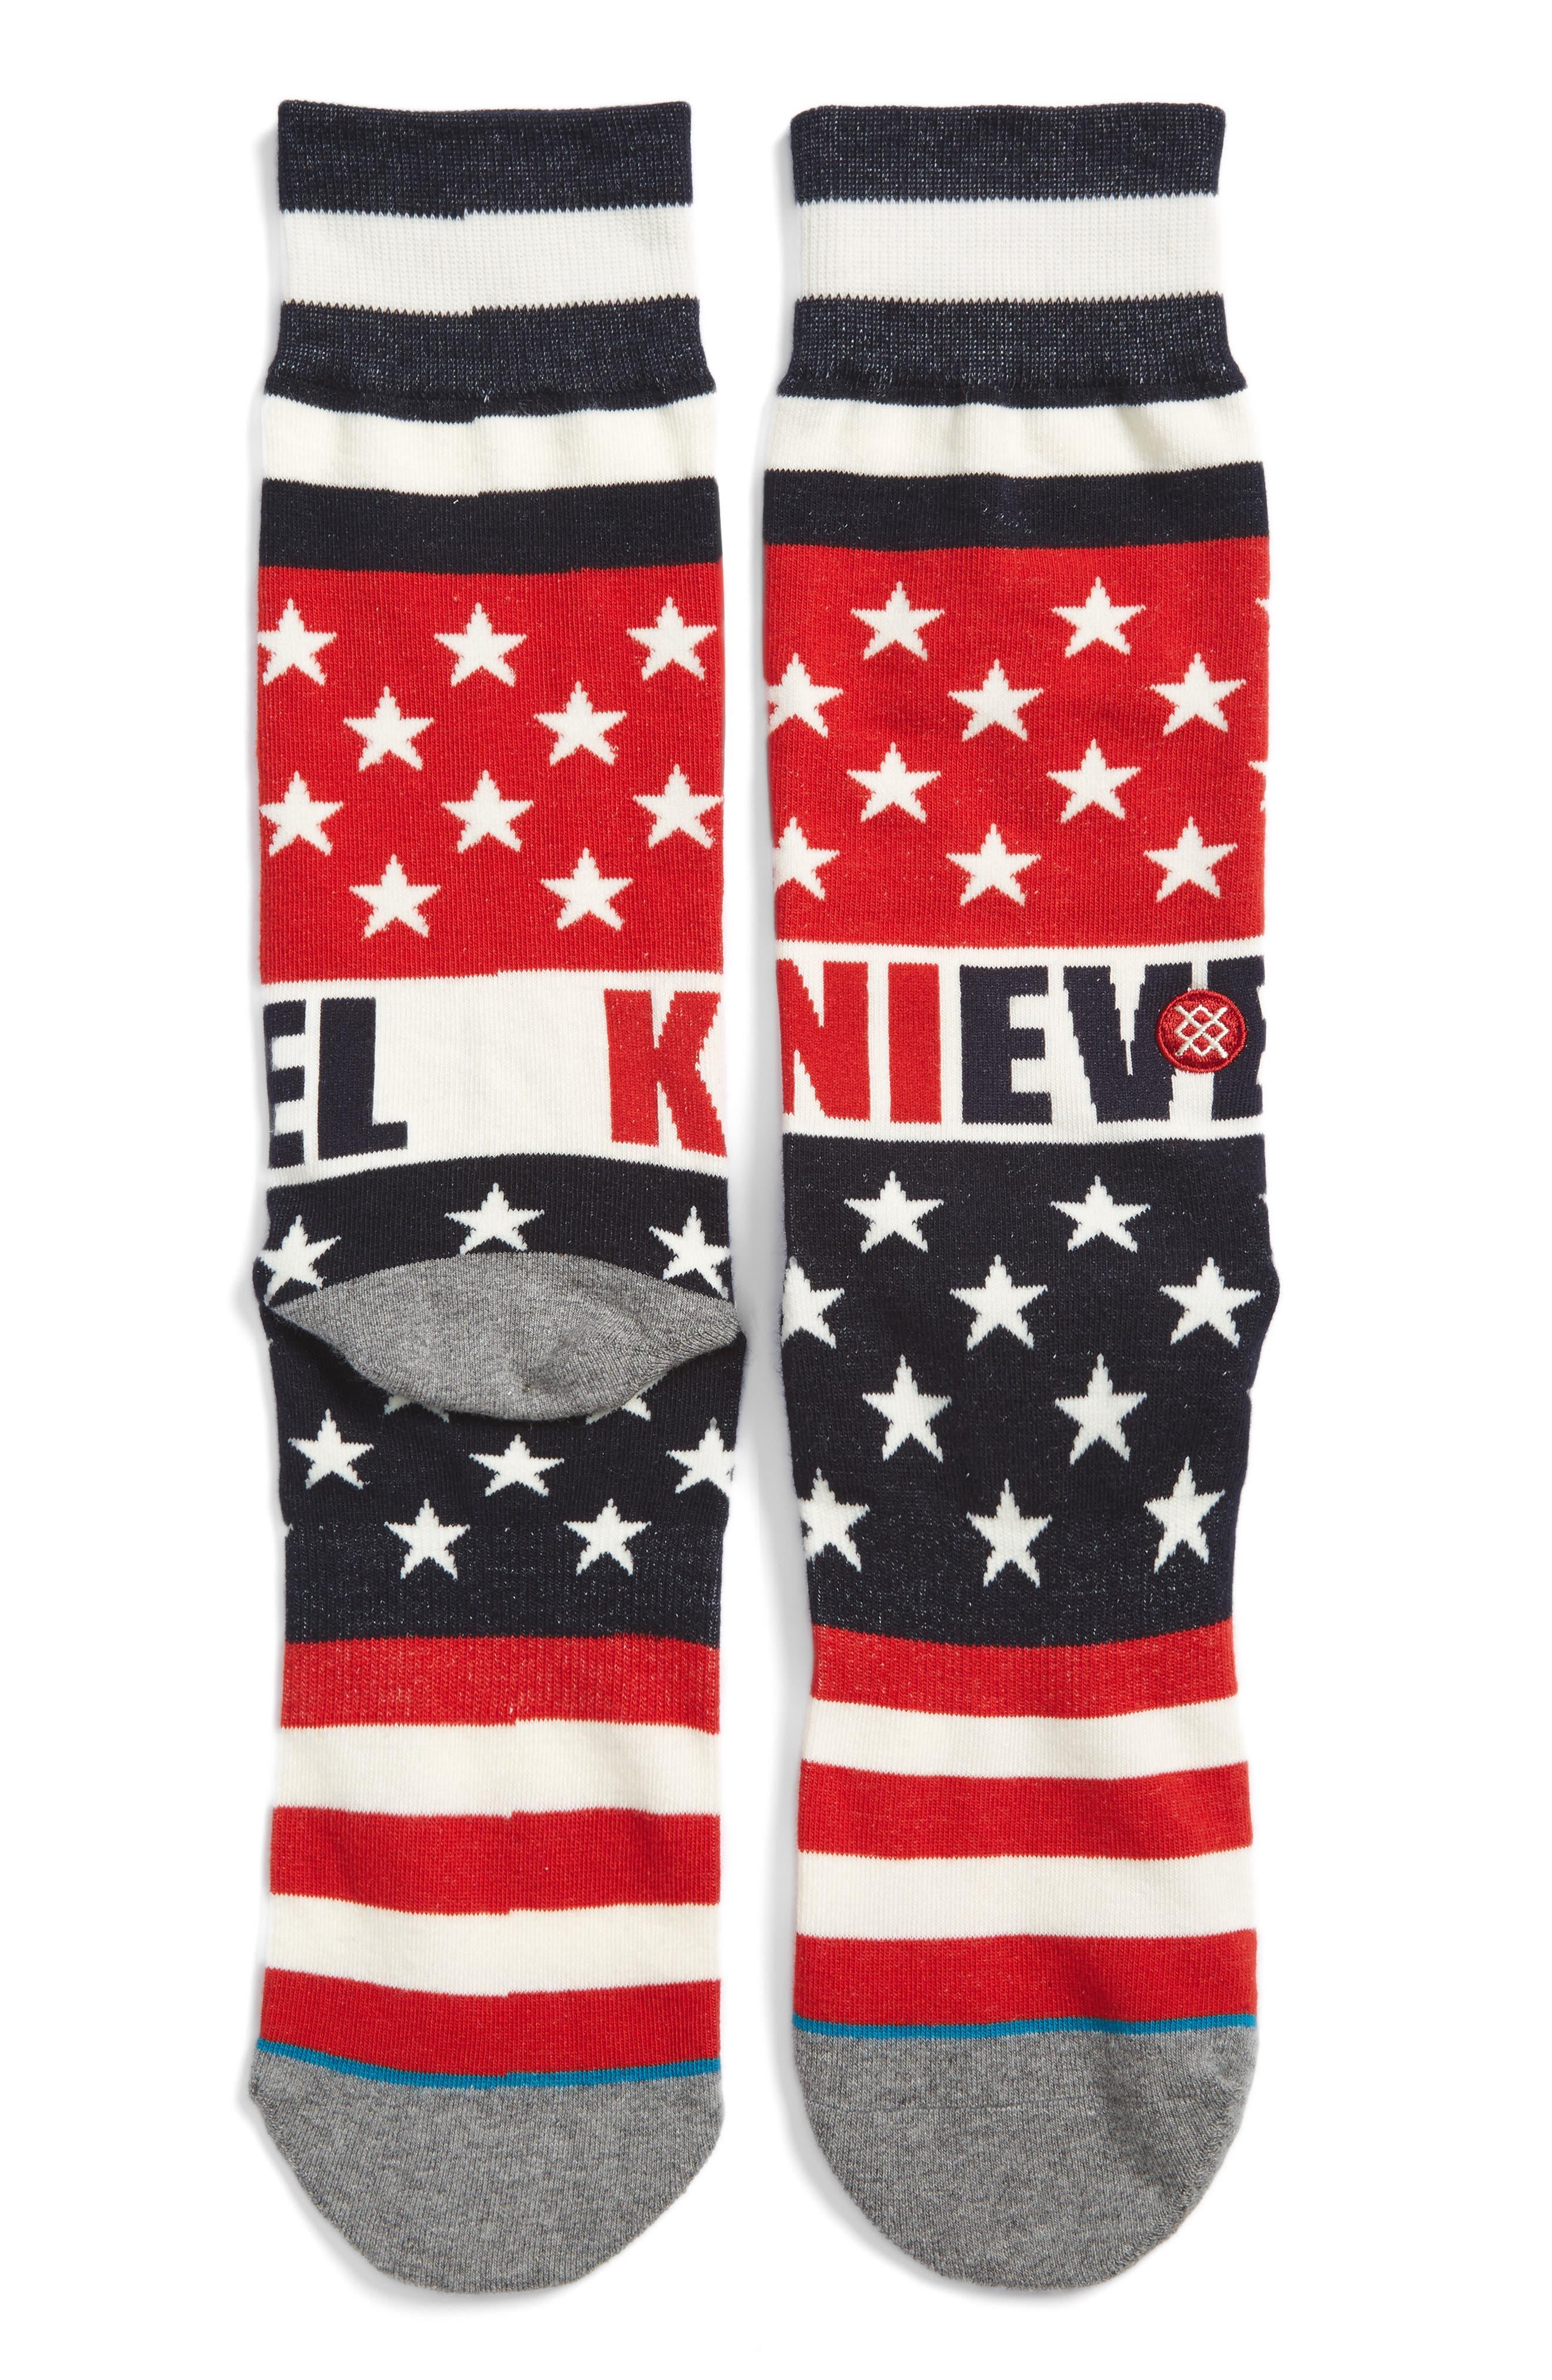 Evel Knievel x Stance Gladiator Socks,                             Main thumbnail 1, color,                             610